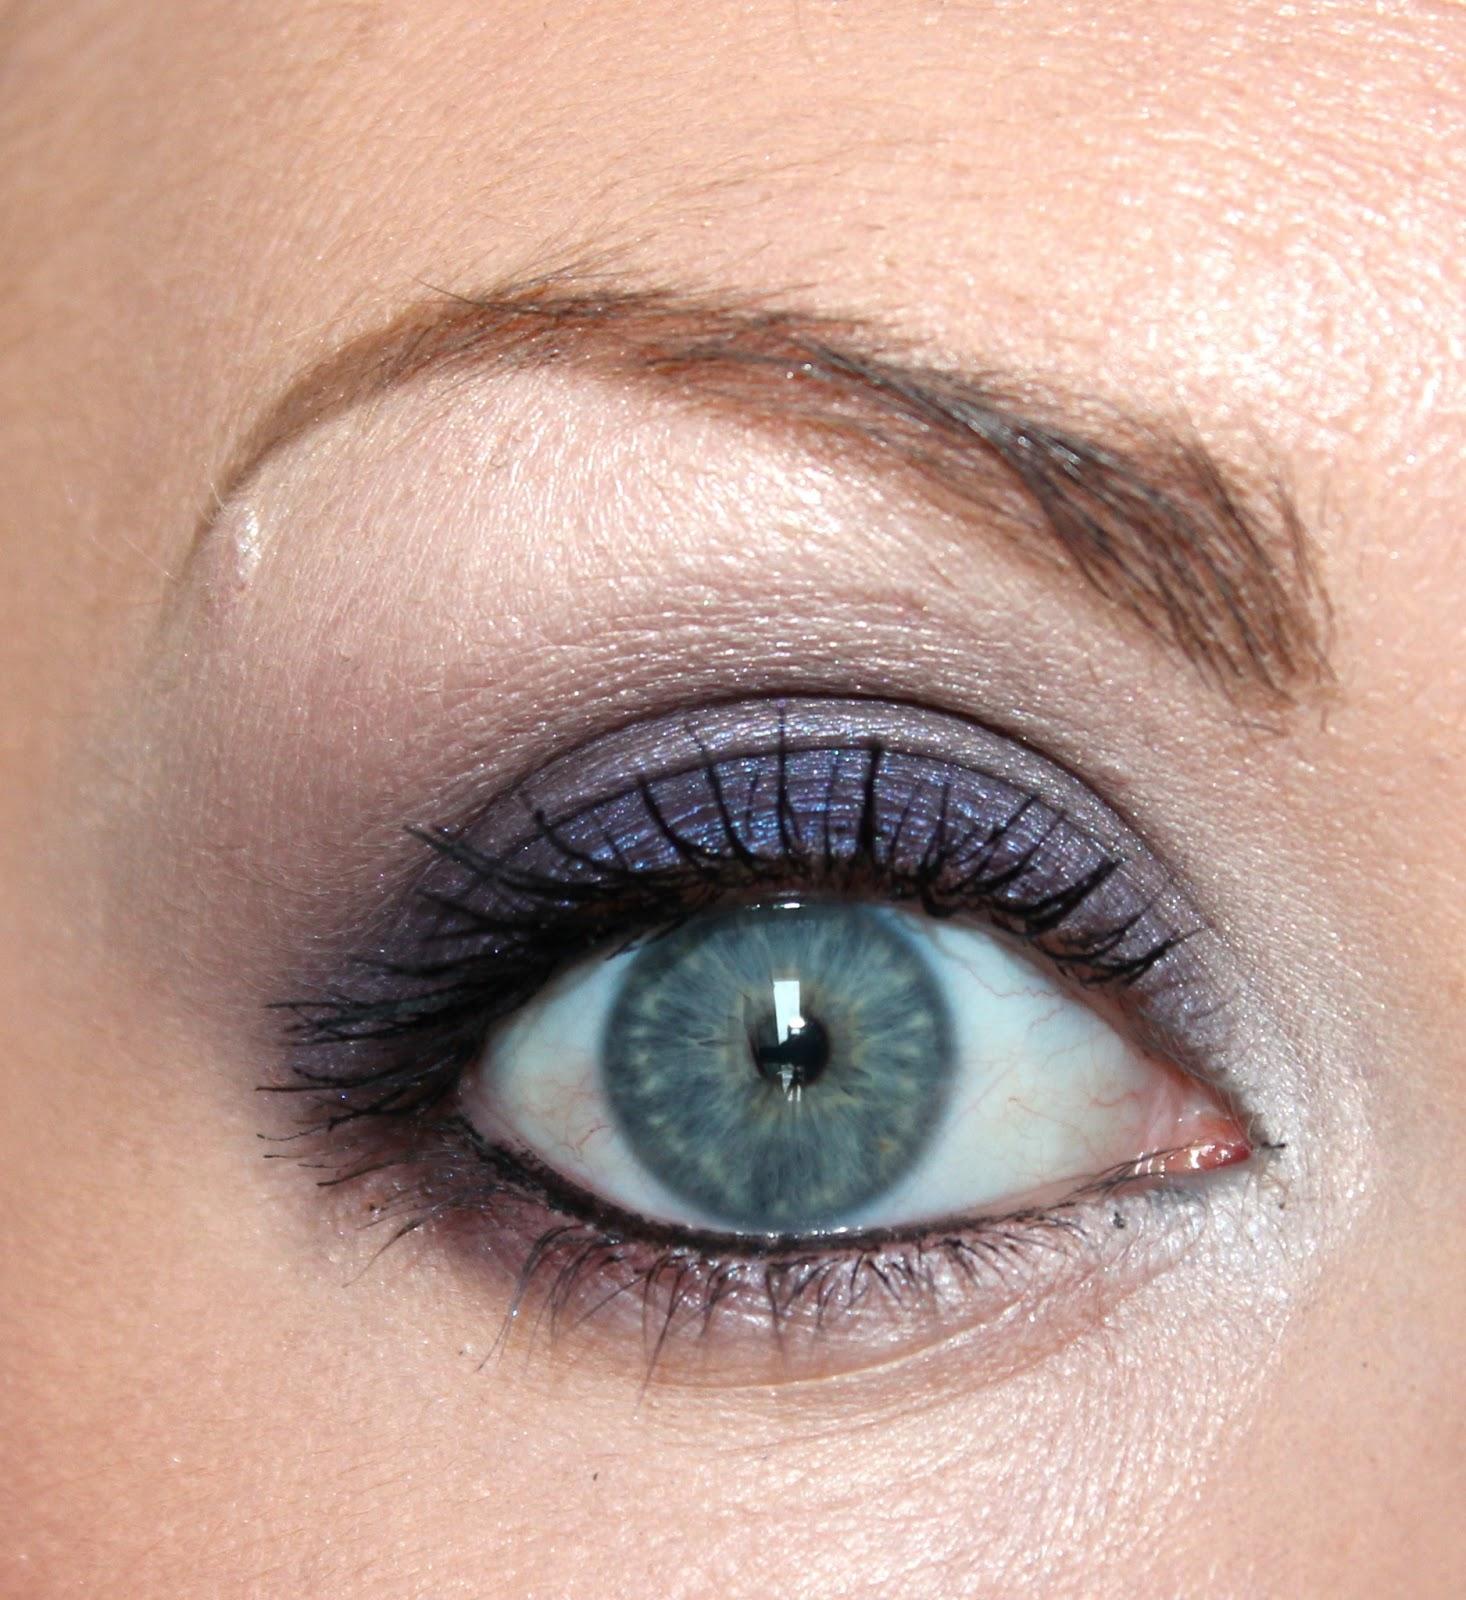 SAM SCHUERMAN: Sapphire Eyes FOTD: Sigma Defining Eyes ...